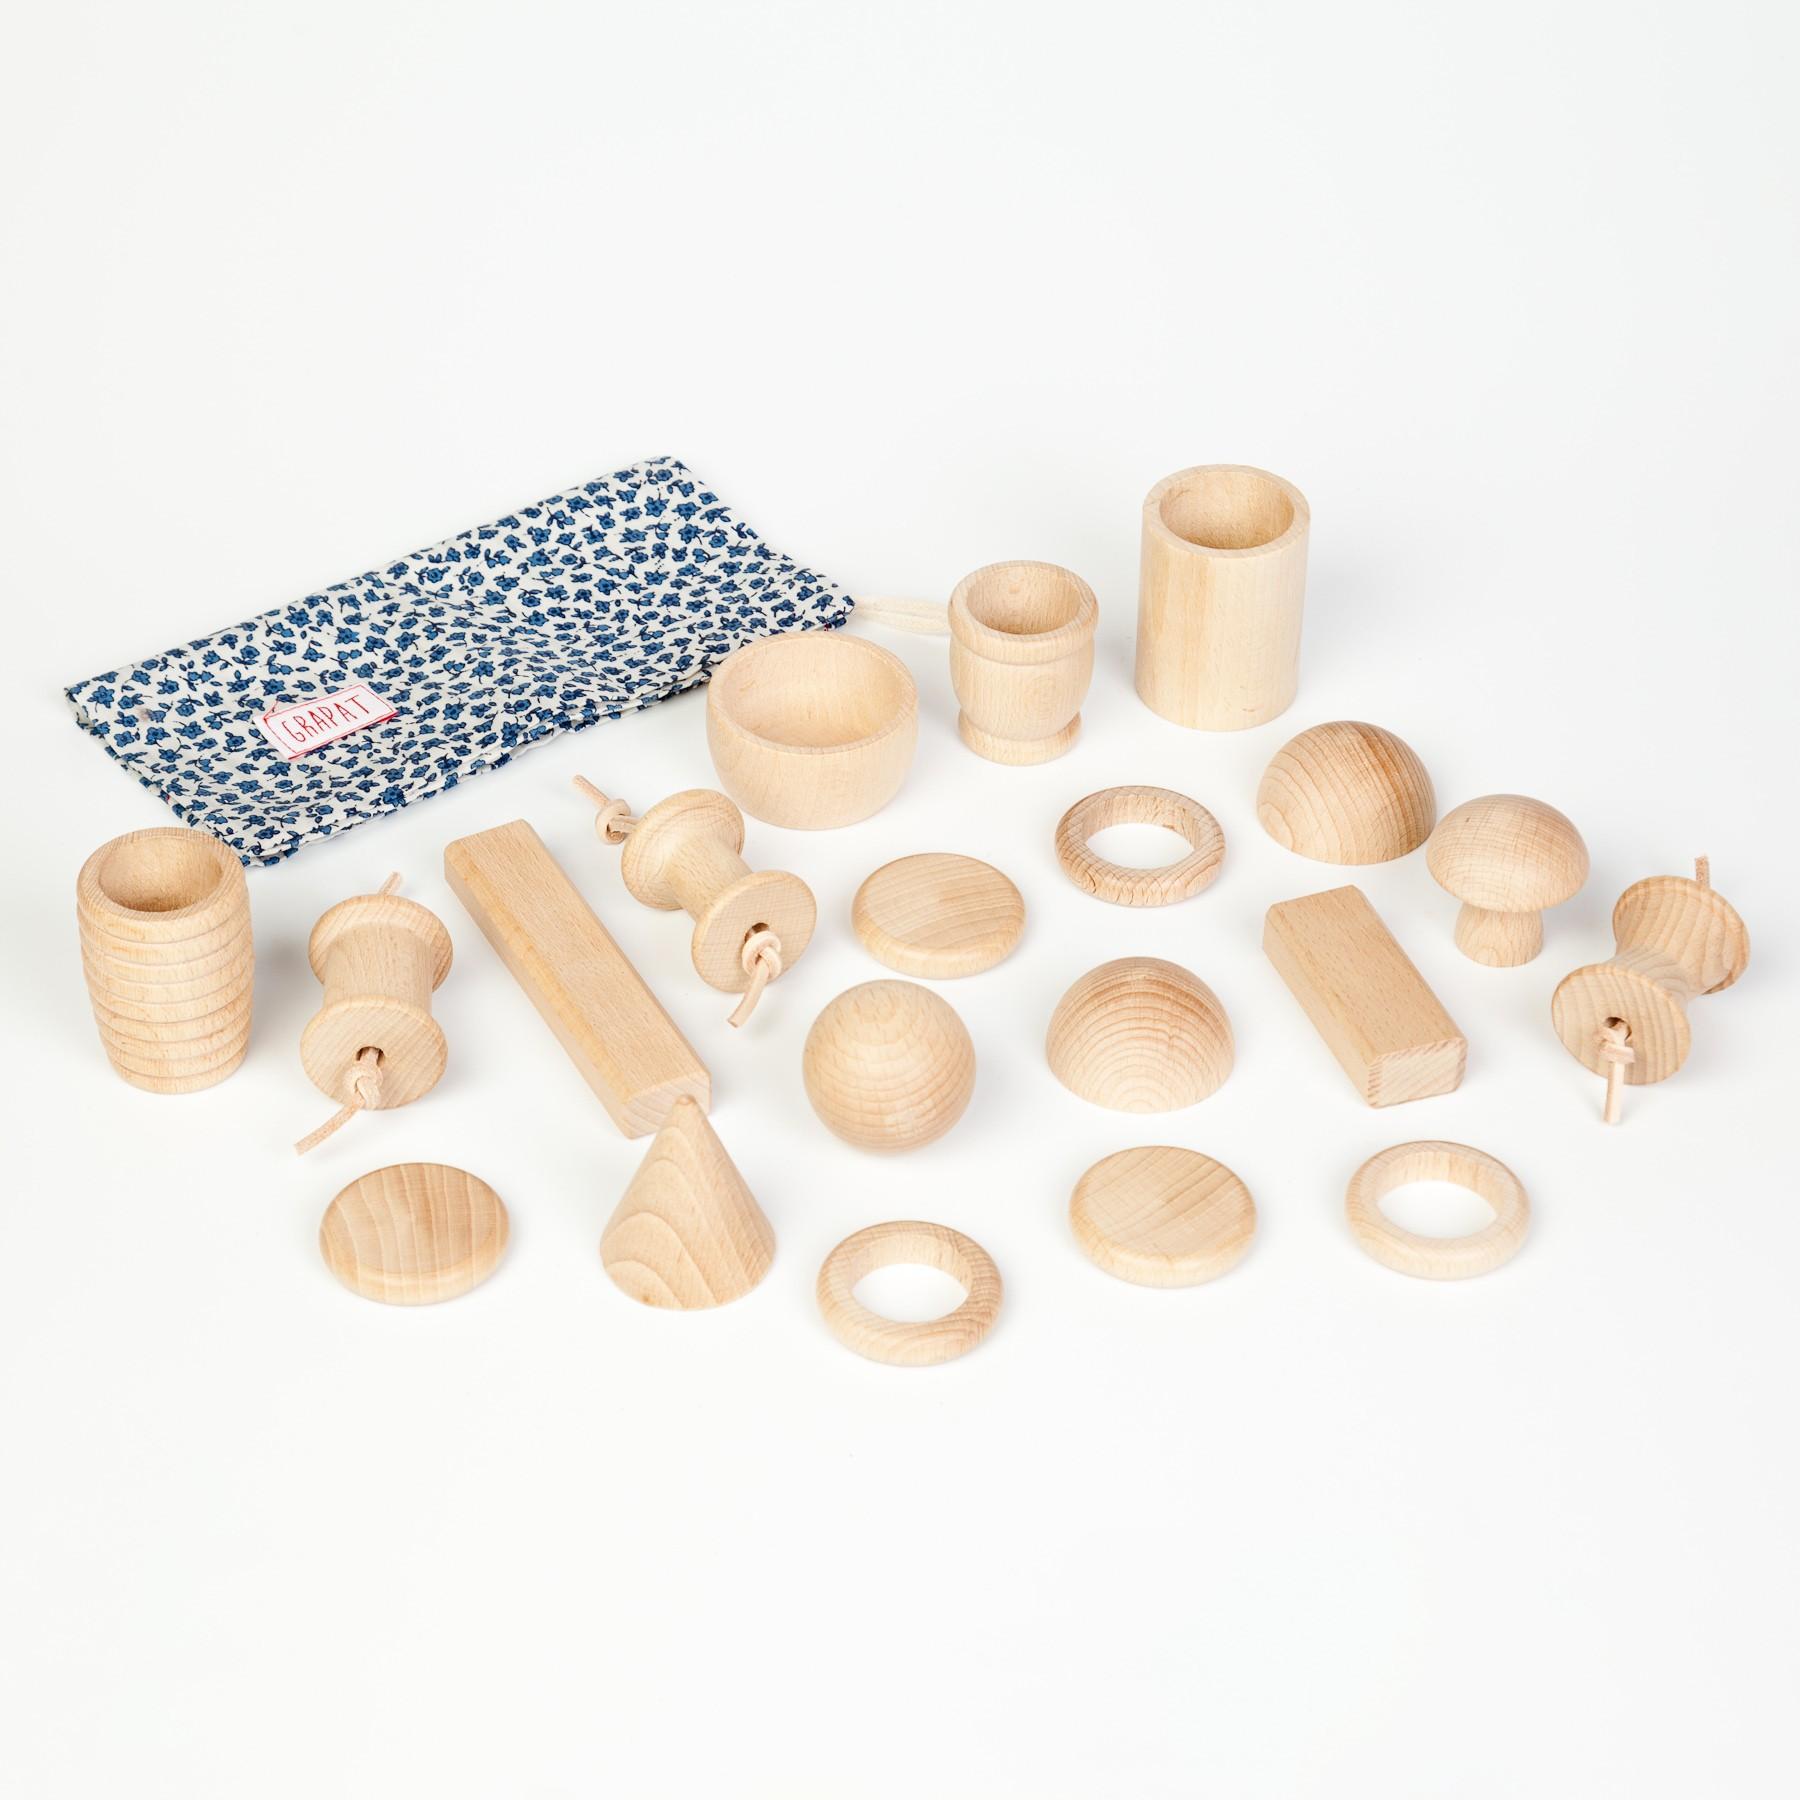 Grapat 20 Wooden Elements Treasure Basket